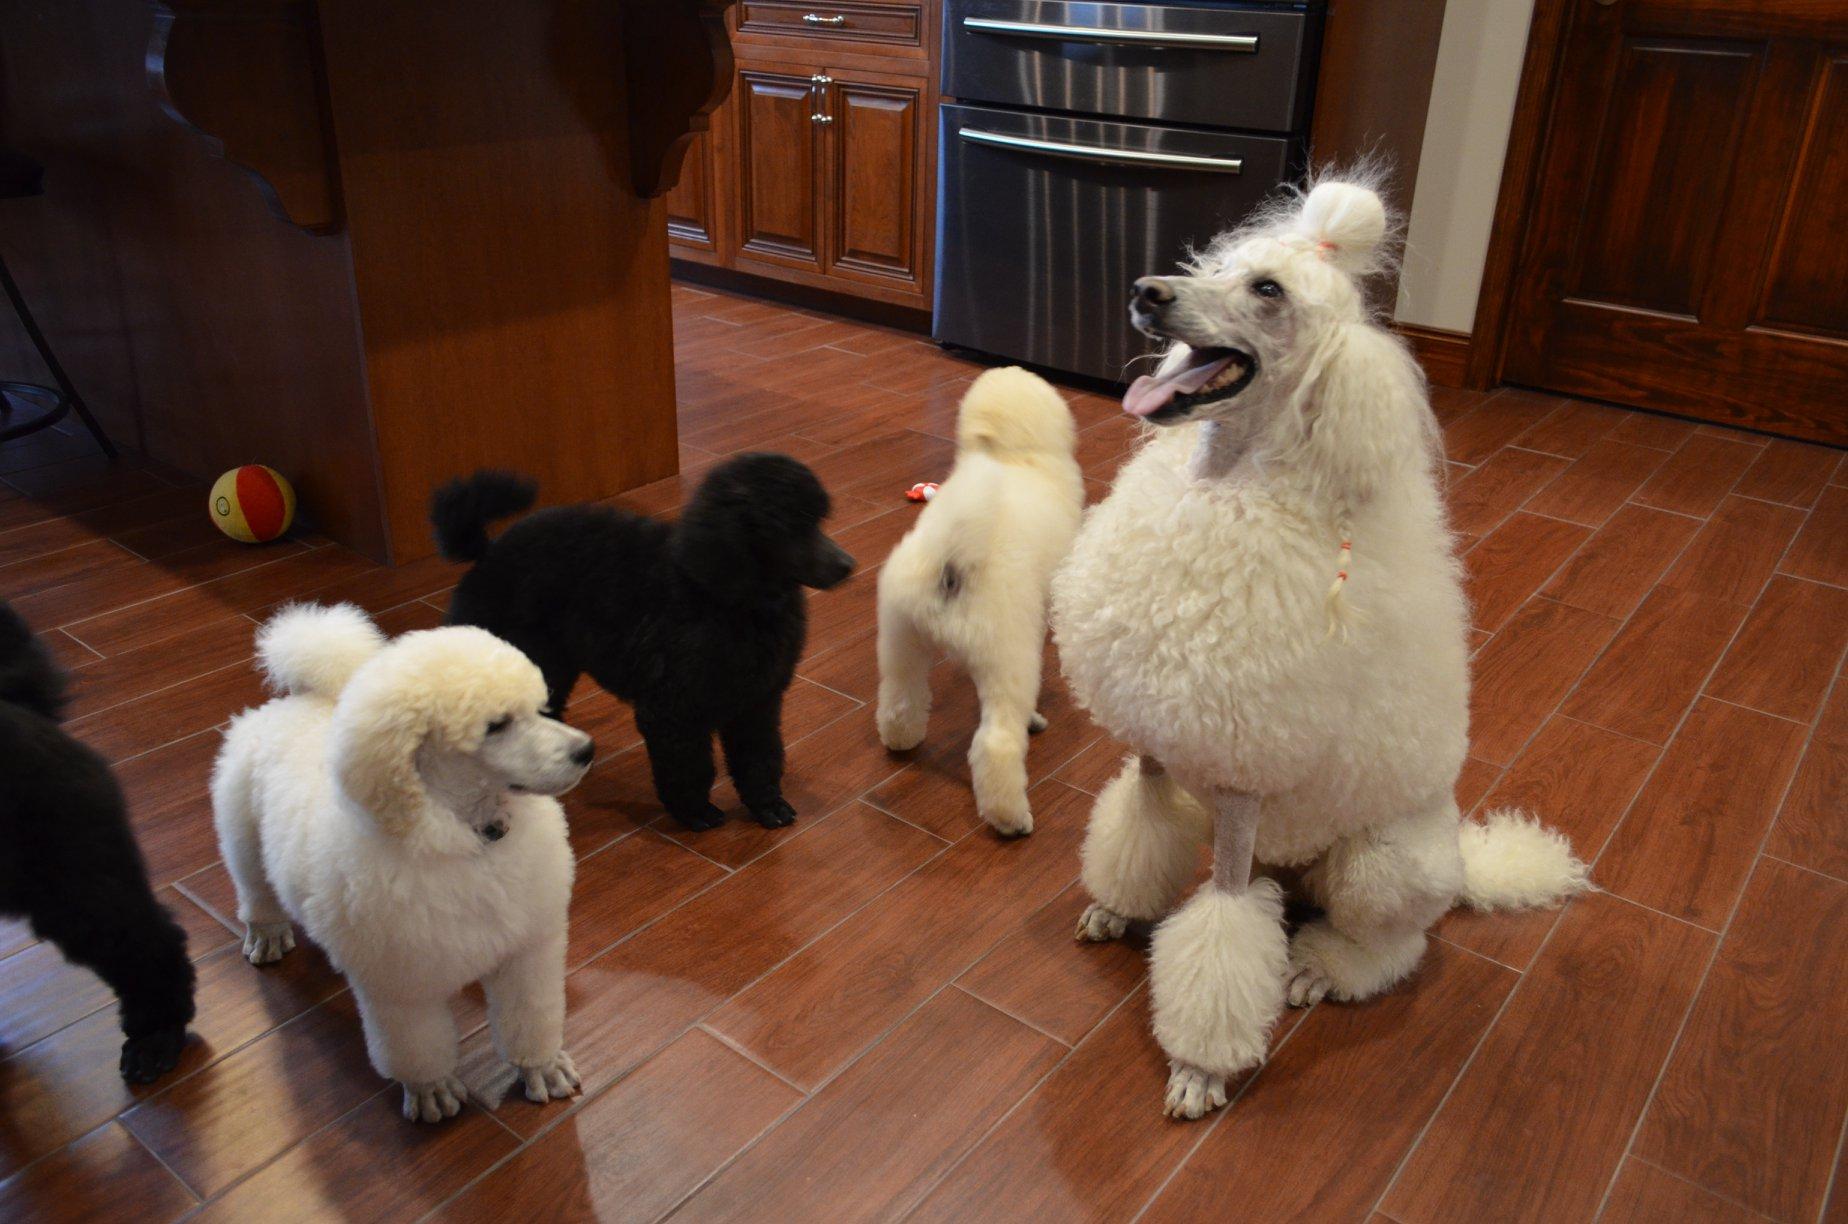 D and D Standard Poodles